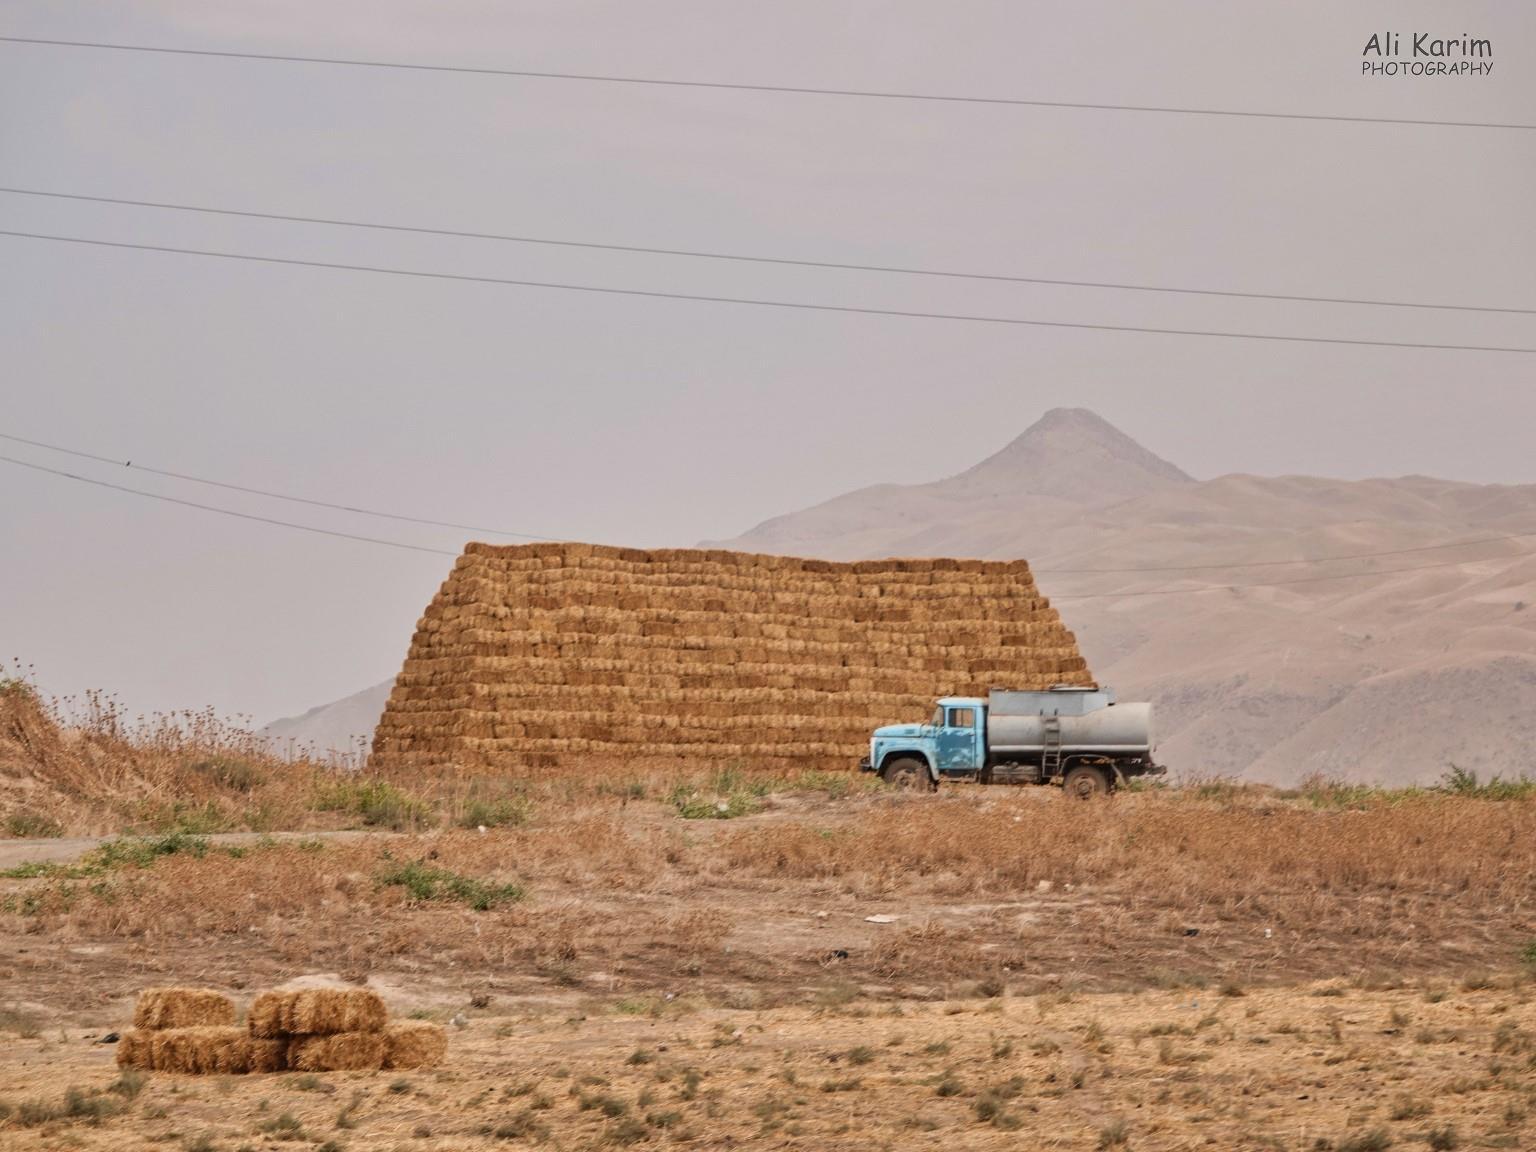 Dushanbe, Tajikistan Lots of farming; making hay while the sun shines